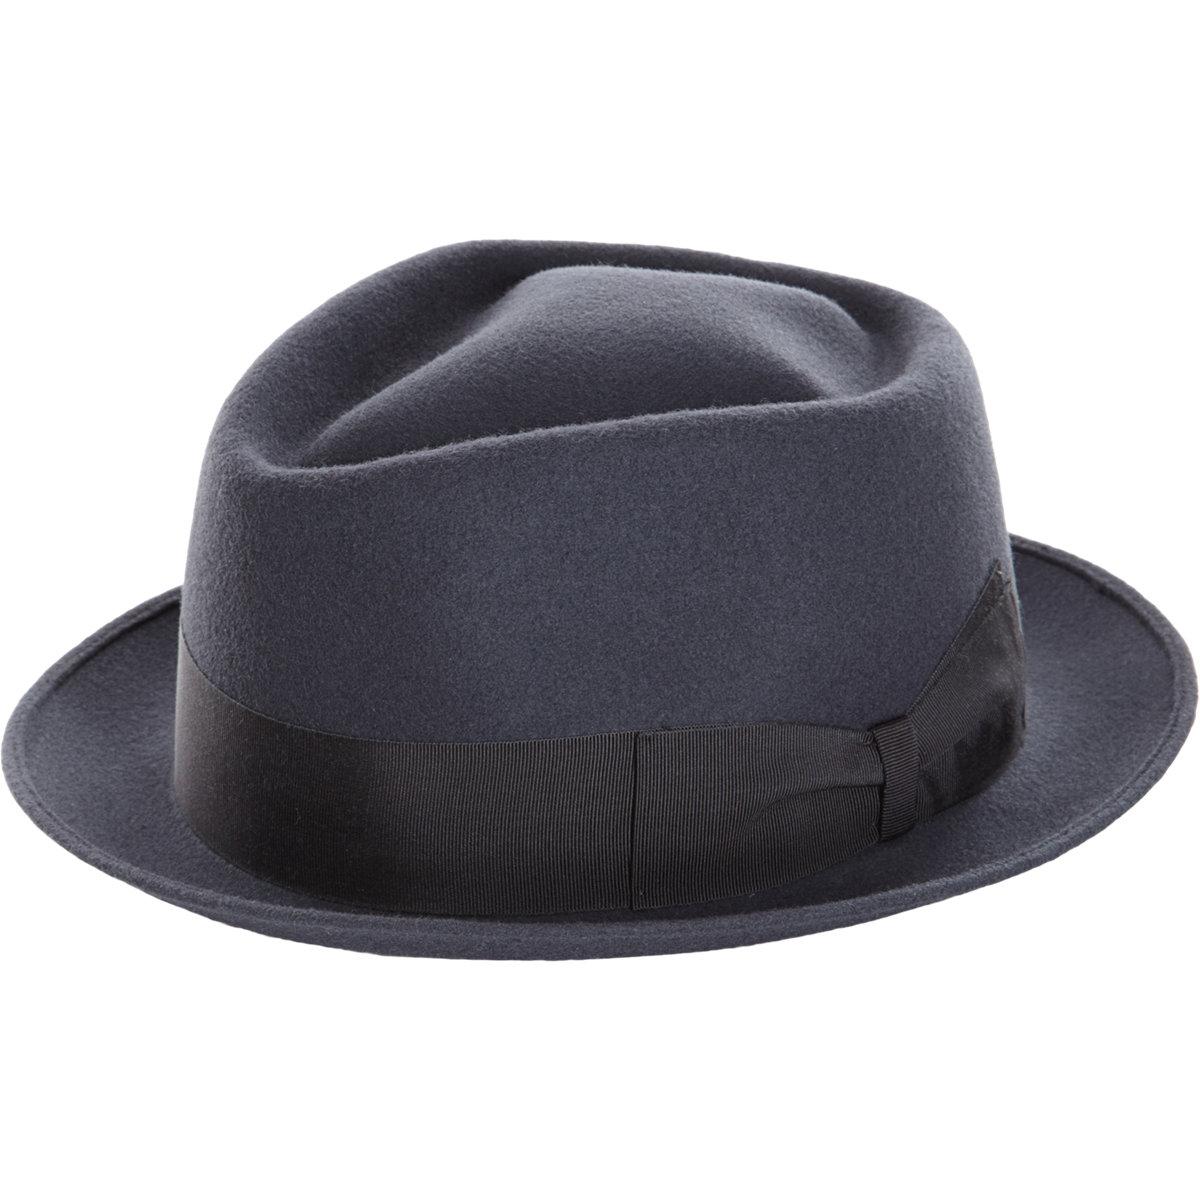 Borsalino Short Brim Fedora In Gray For Men Lyst